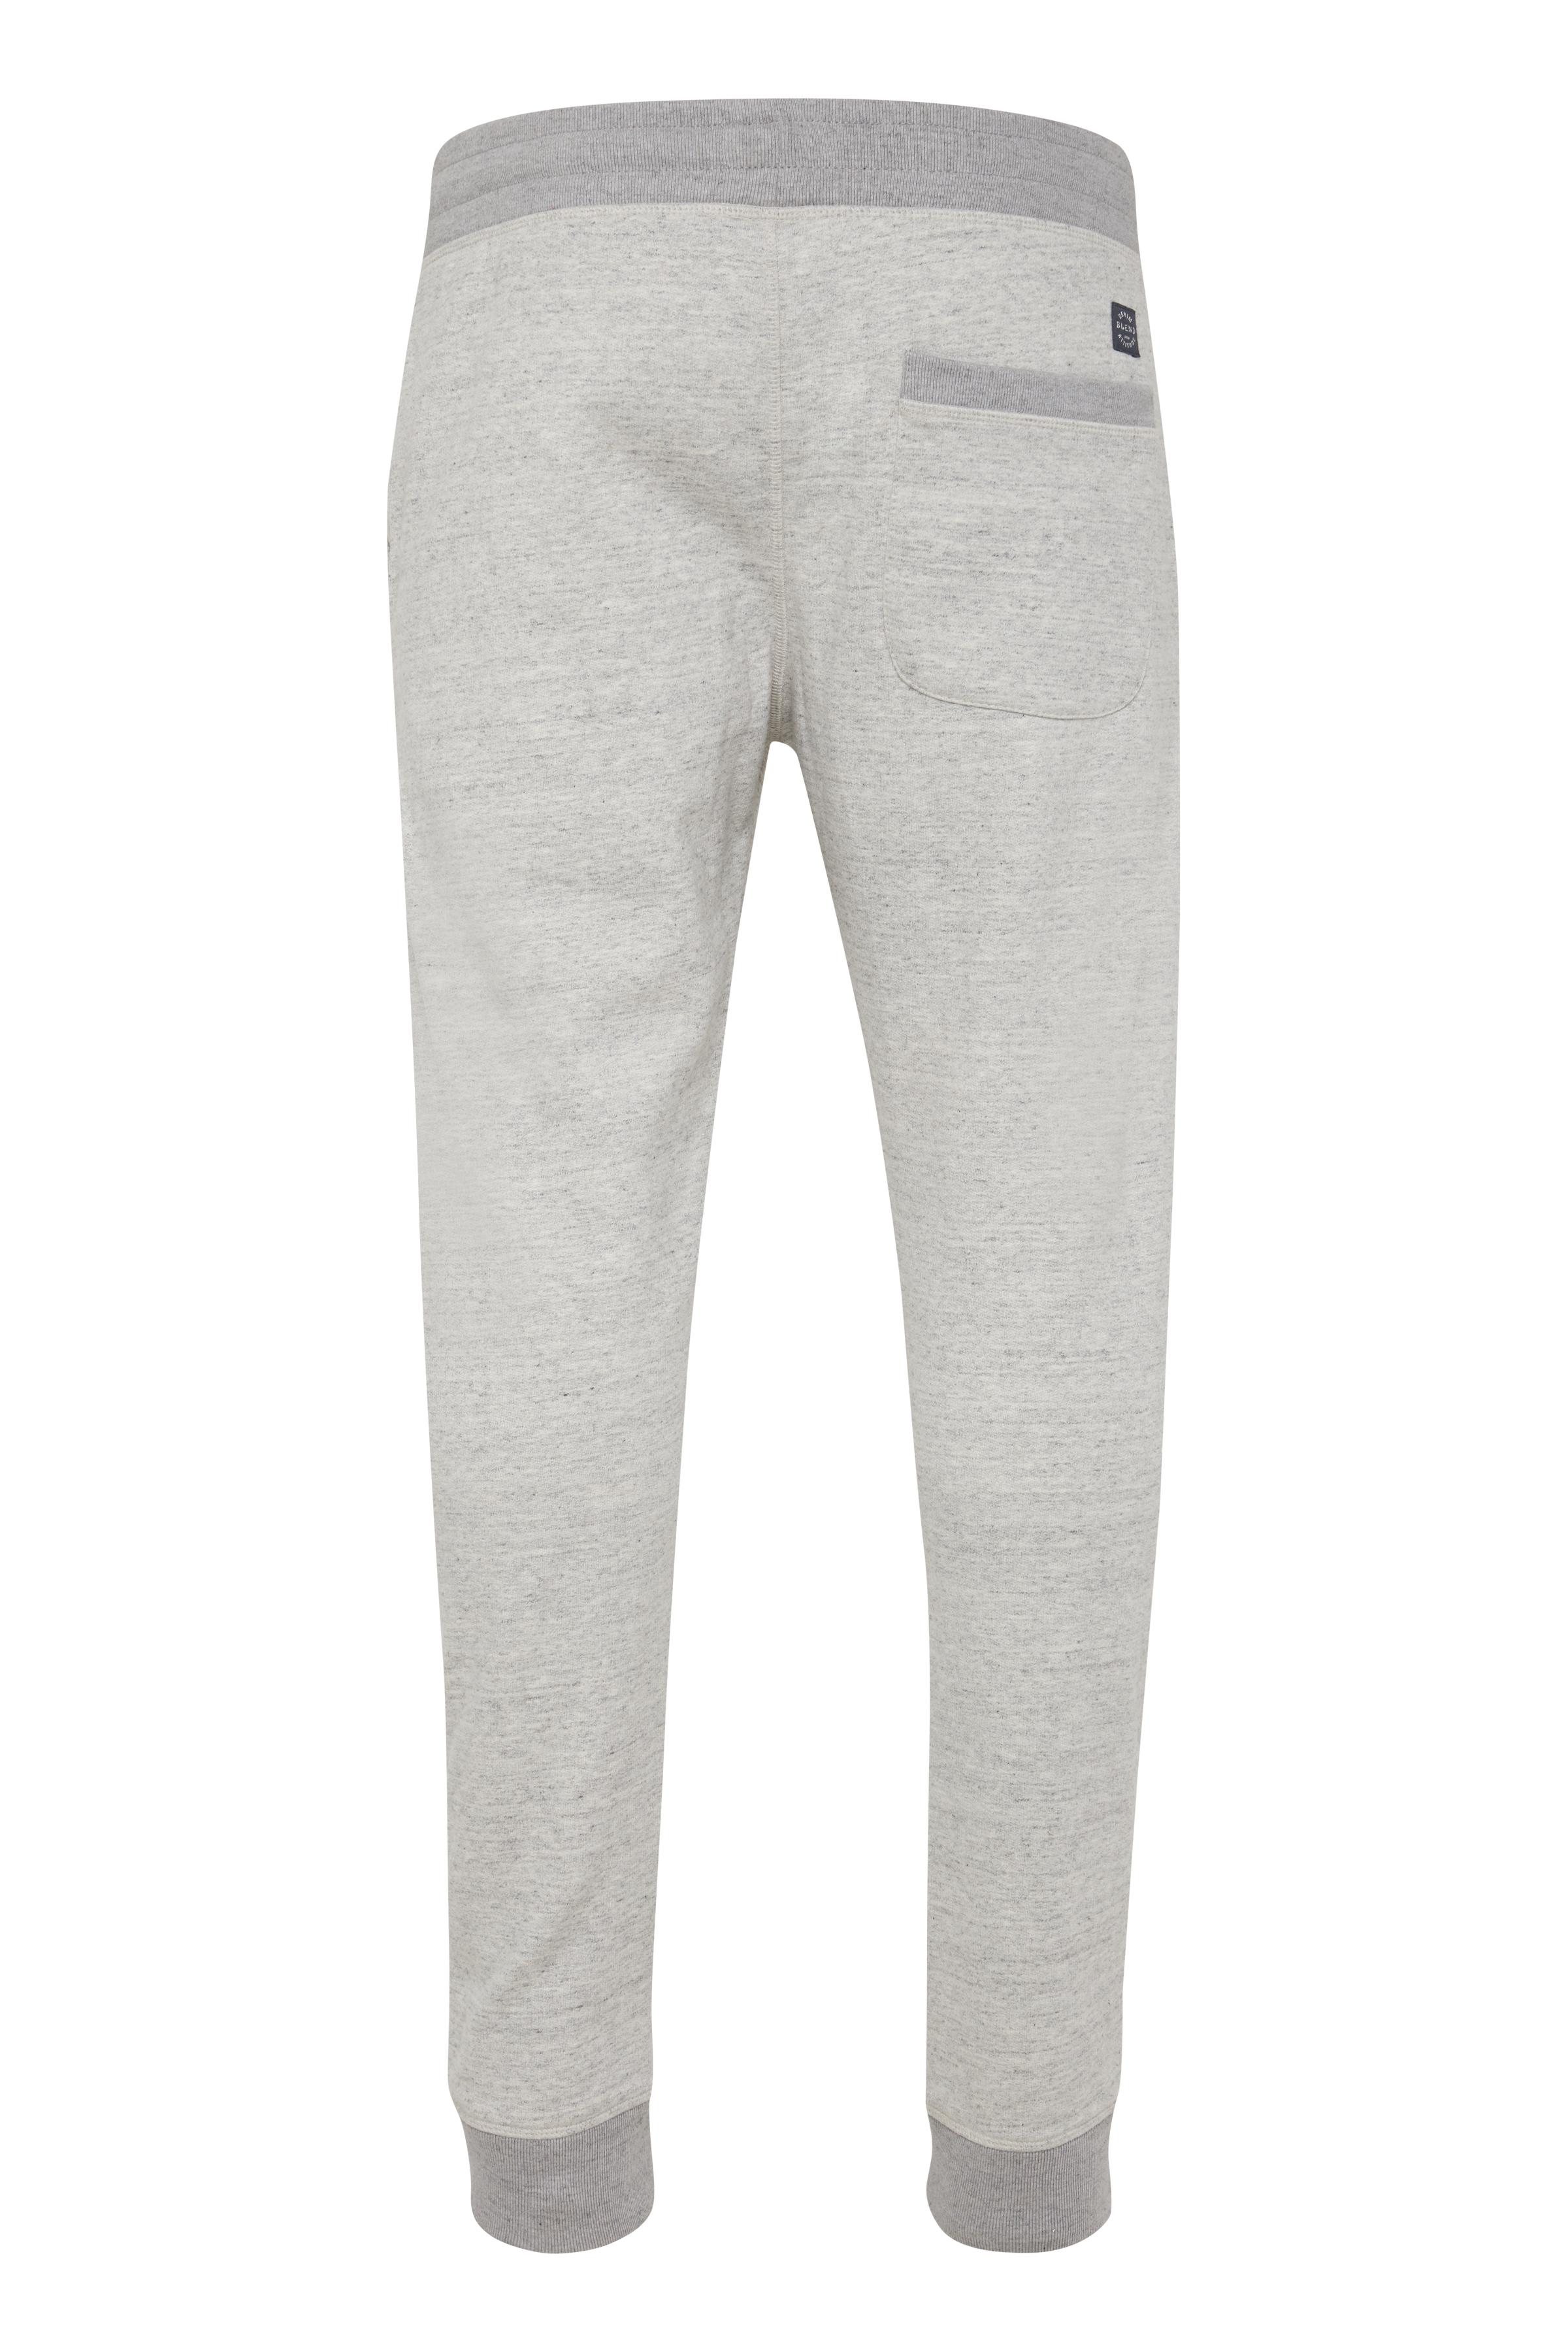 Stone mix Pants-knitted fra Blend He – Køb Stone mix Pants-knitted fra str. S-3XL her